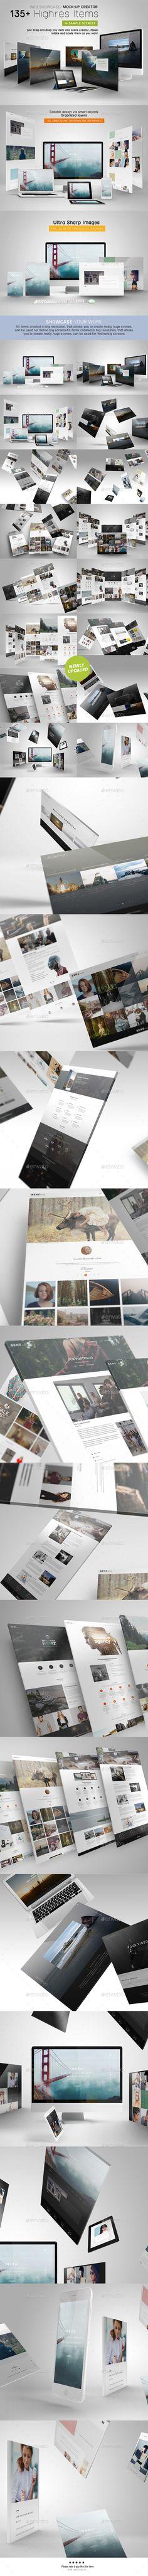 Web Showcase/ Mock-up Creator - Multiple Displays